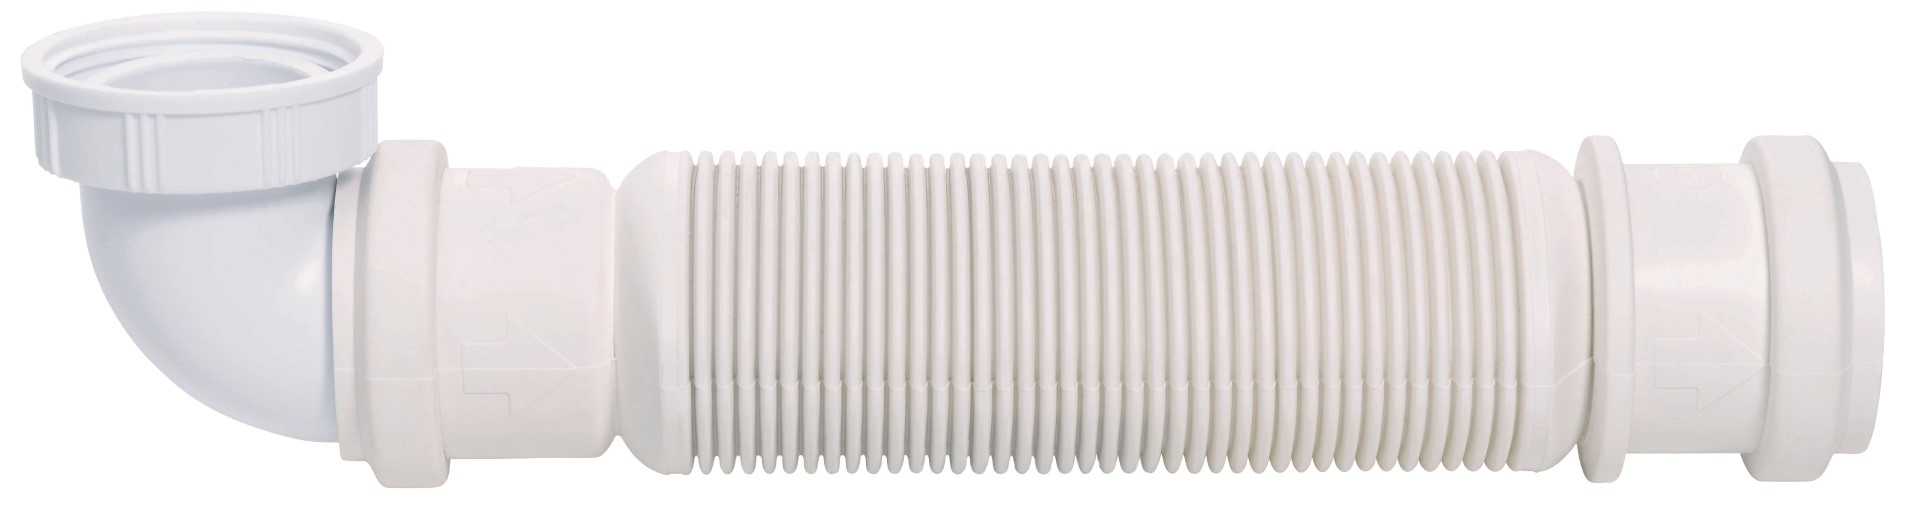 Sifon flexibil chiuveta Wirquin PRO Senzo extra-plat 1 1/2 D40 membrana antimiros imagine sensodays.ro